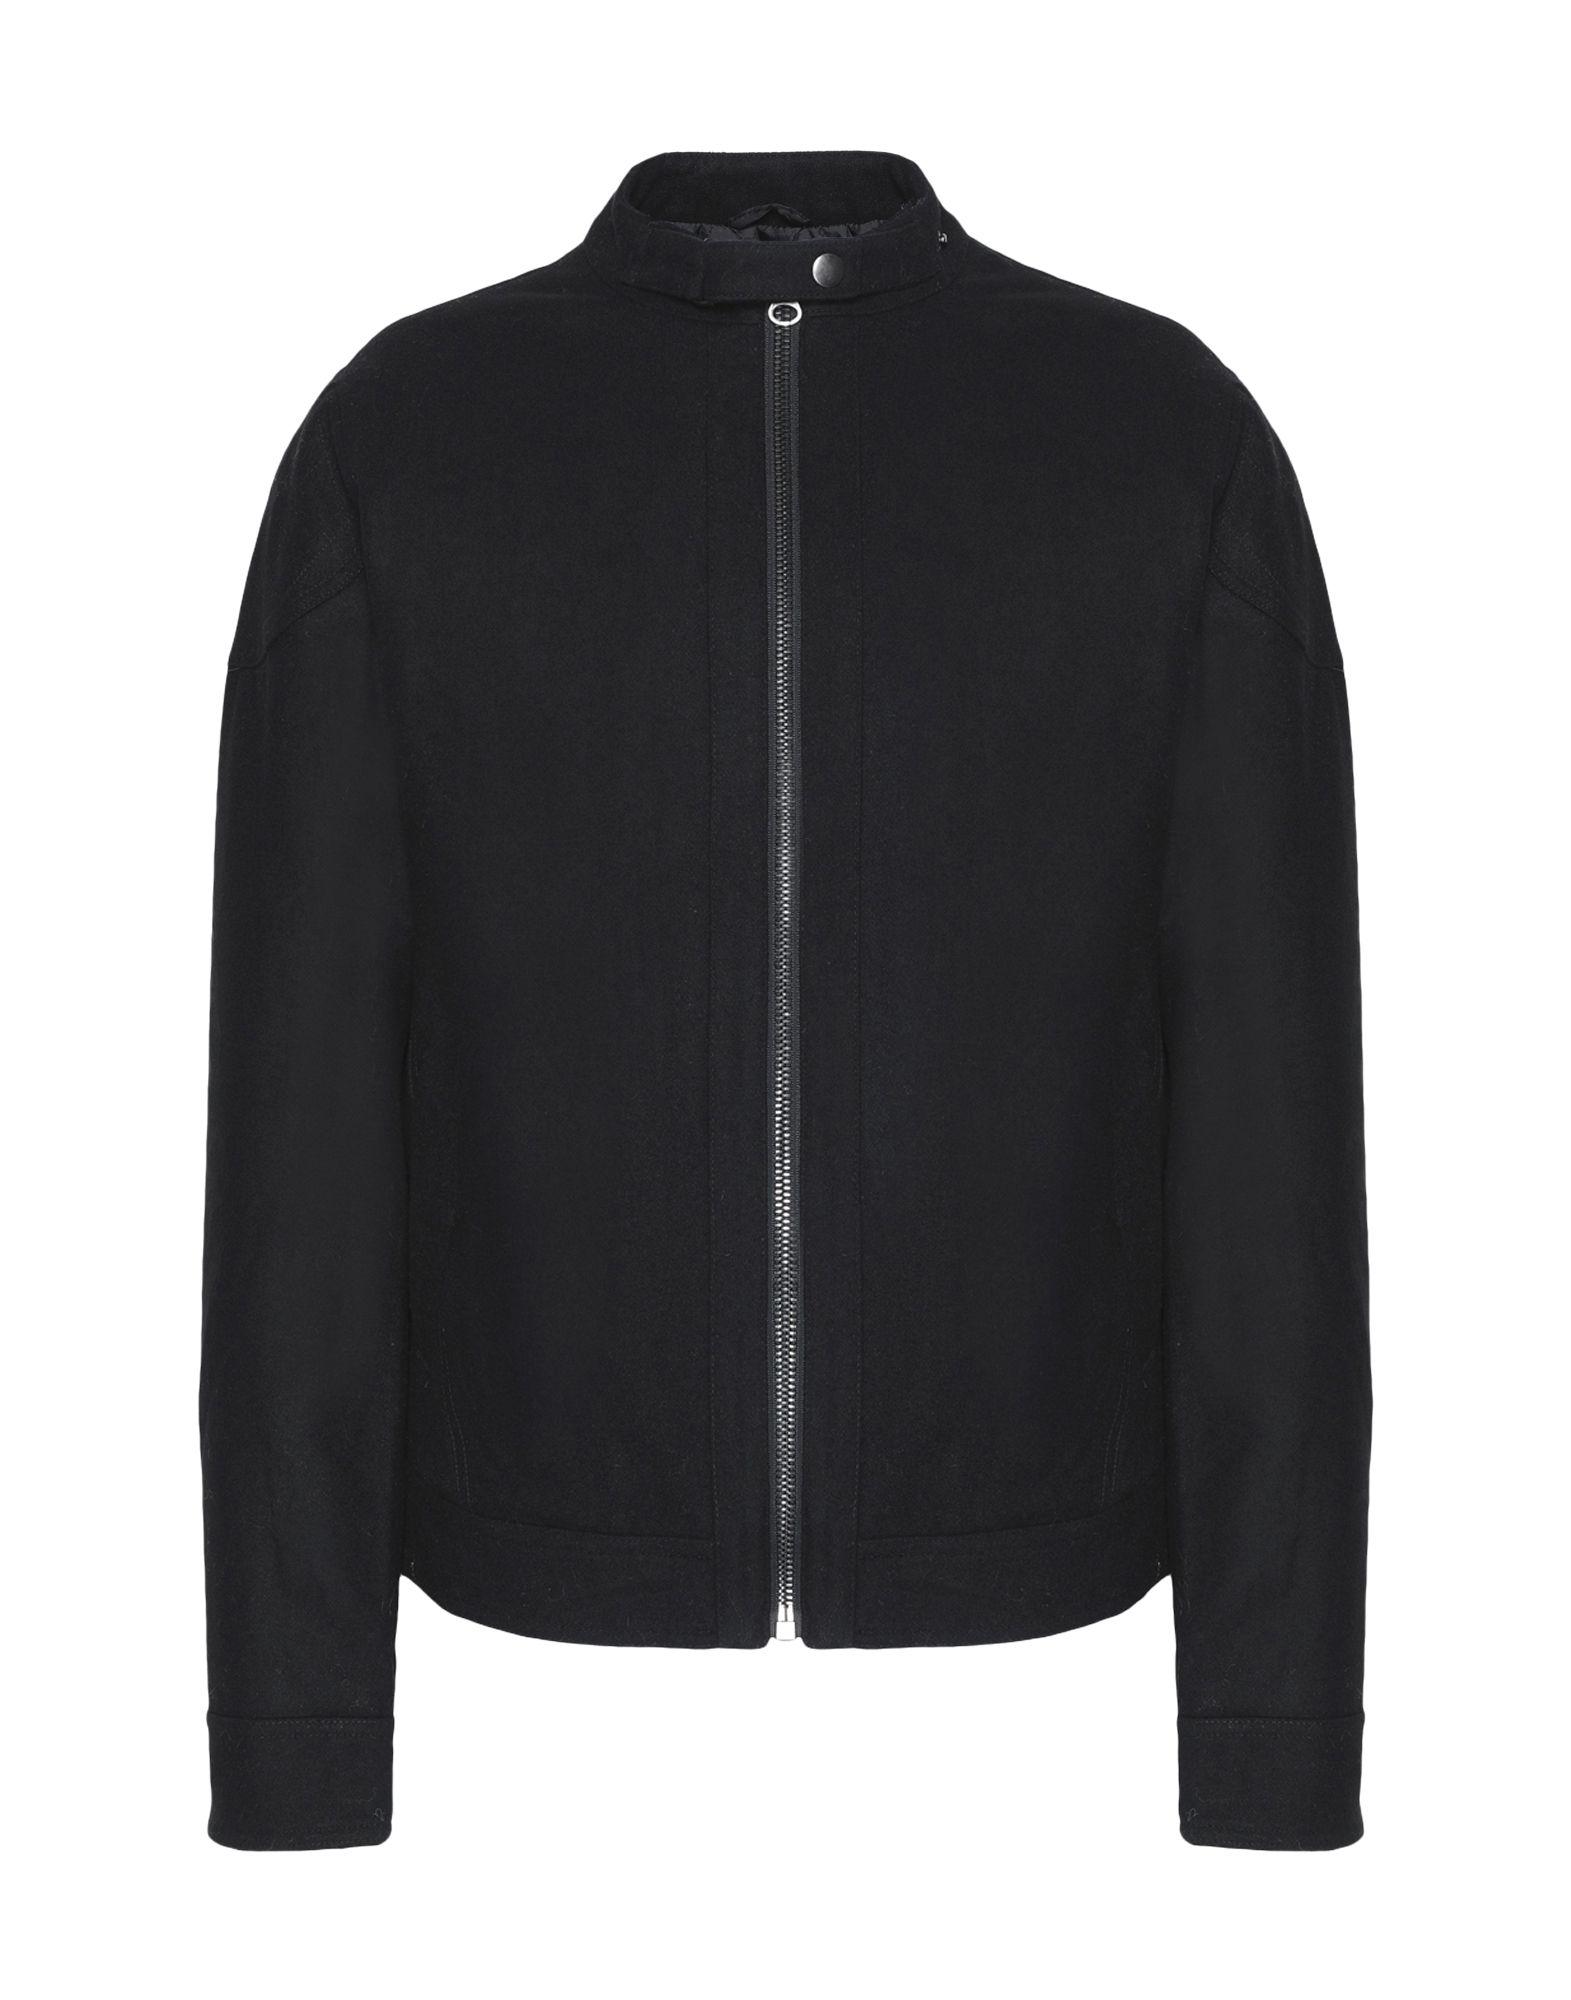 8 by YOOX Куртка 8 by yoox джинсовая верхняя одежда